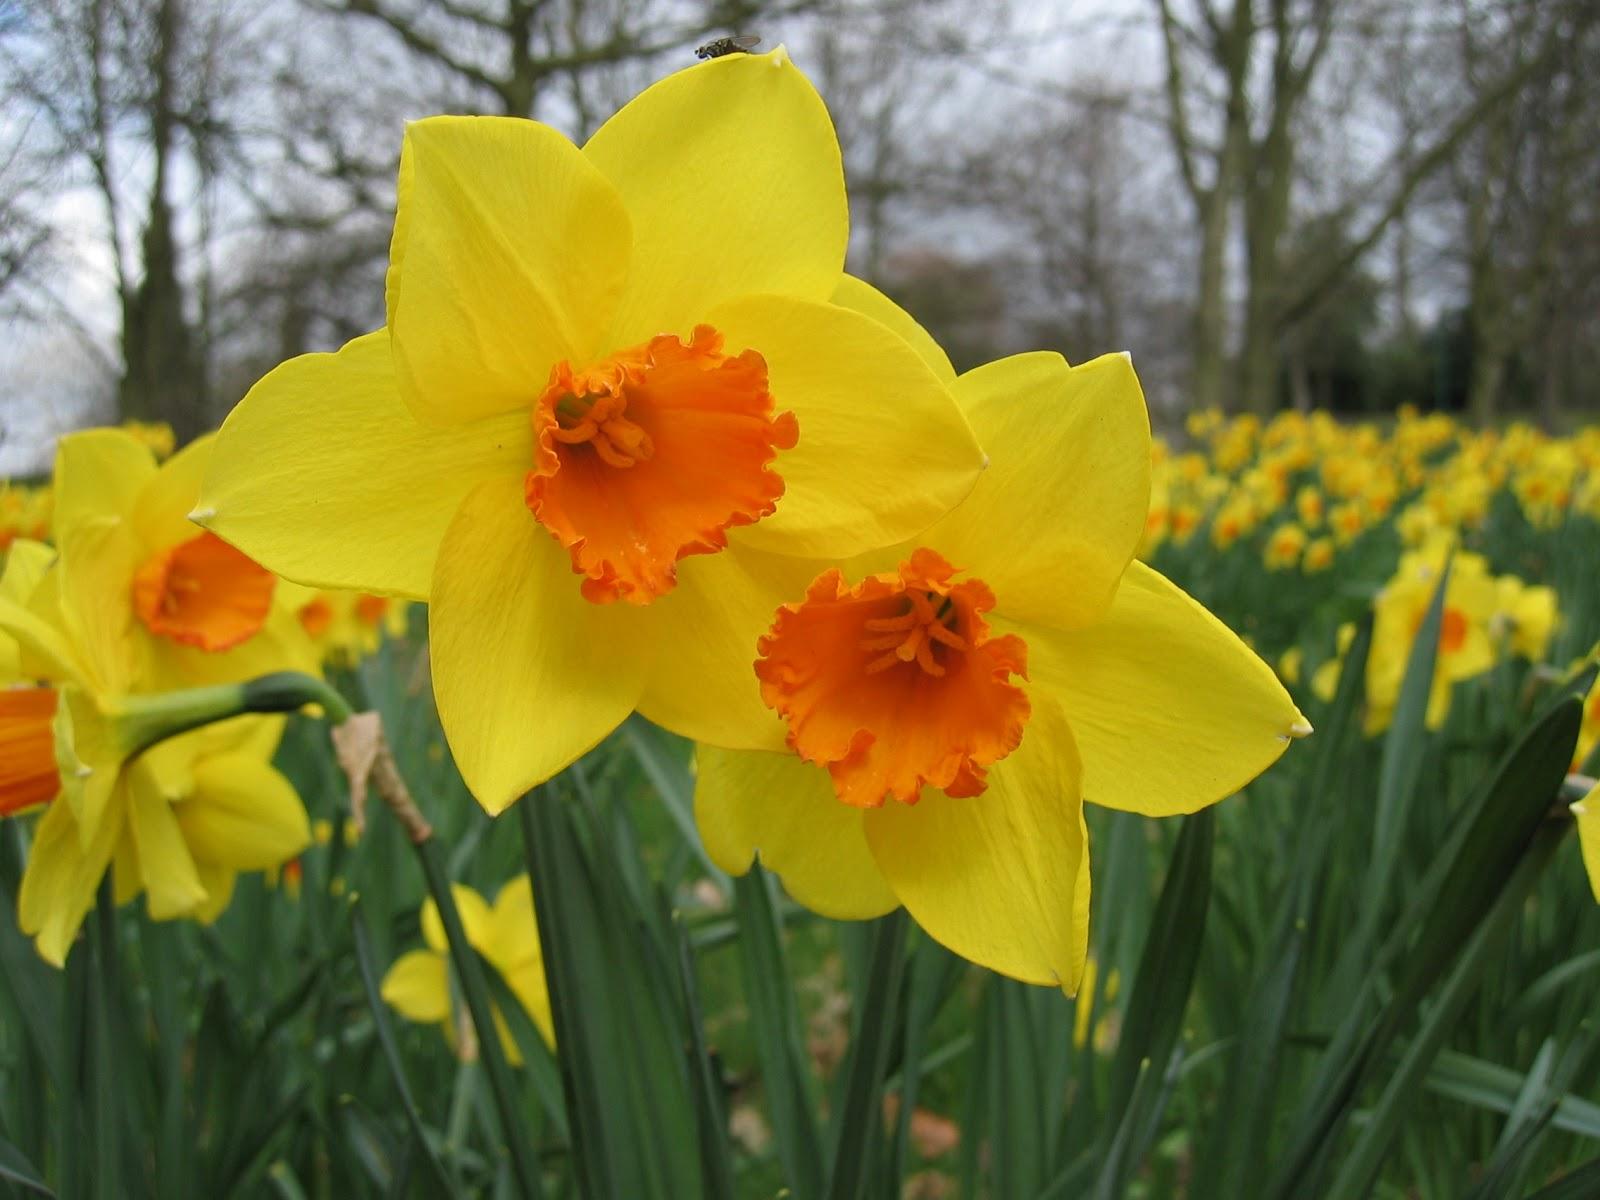 http://4.bp.blogspot.com/-g9nLgi8tk40/UIoma-FKSjI/AAAAAAAADZk/gRhhyMnNNgw/s1600/Daffodil-Flower-Picture-5.jpg